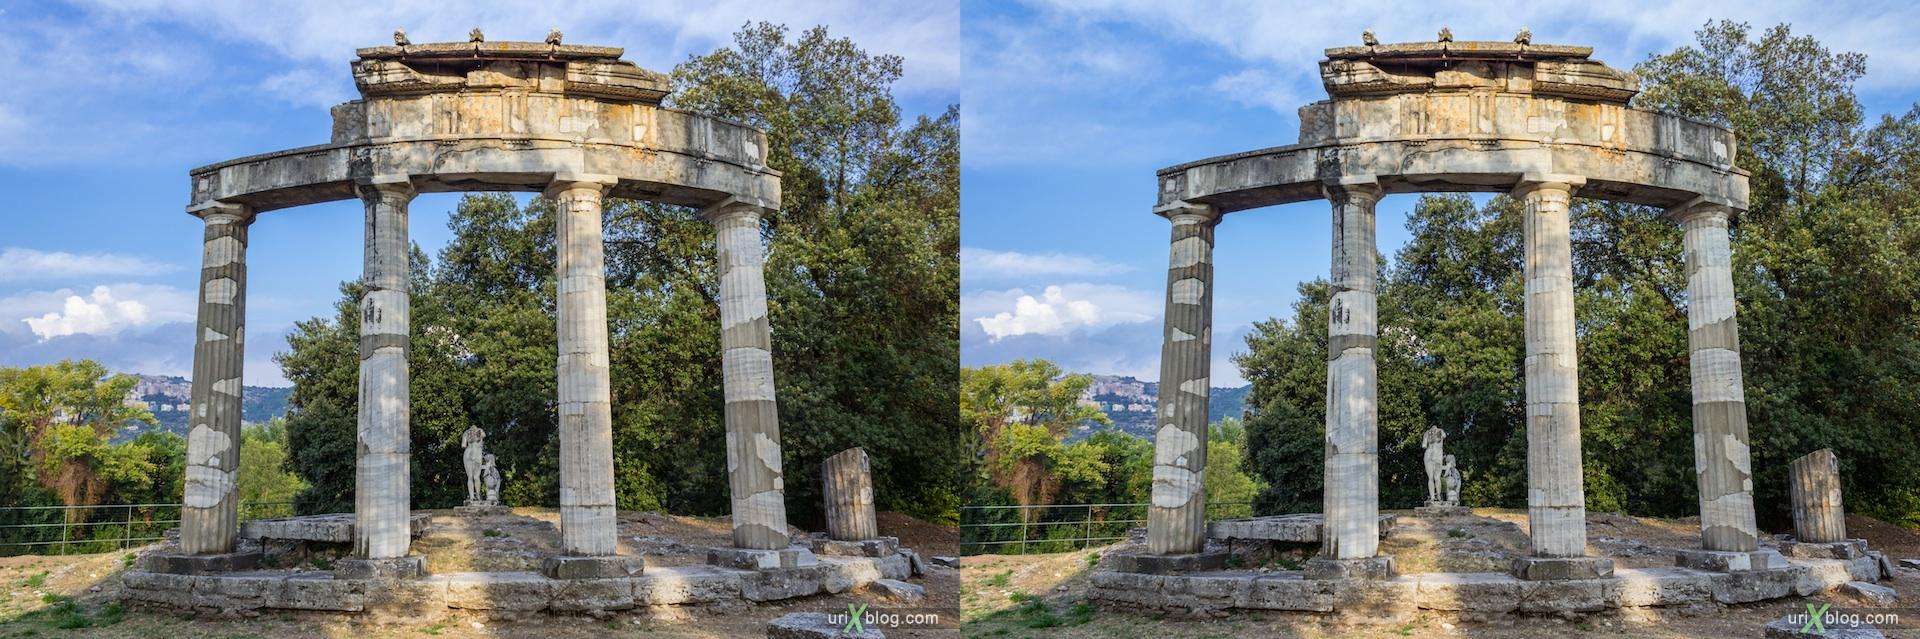 2012, Tempio di Venere, Villa Adriana, Italy, Tivoli, Ancient Rome, 3D, stereo pair, cross-eyed, crossview, cross view stereo pair